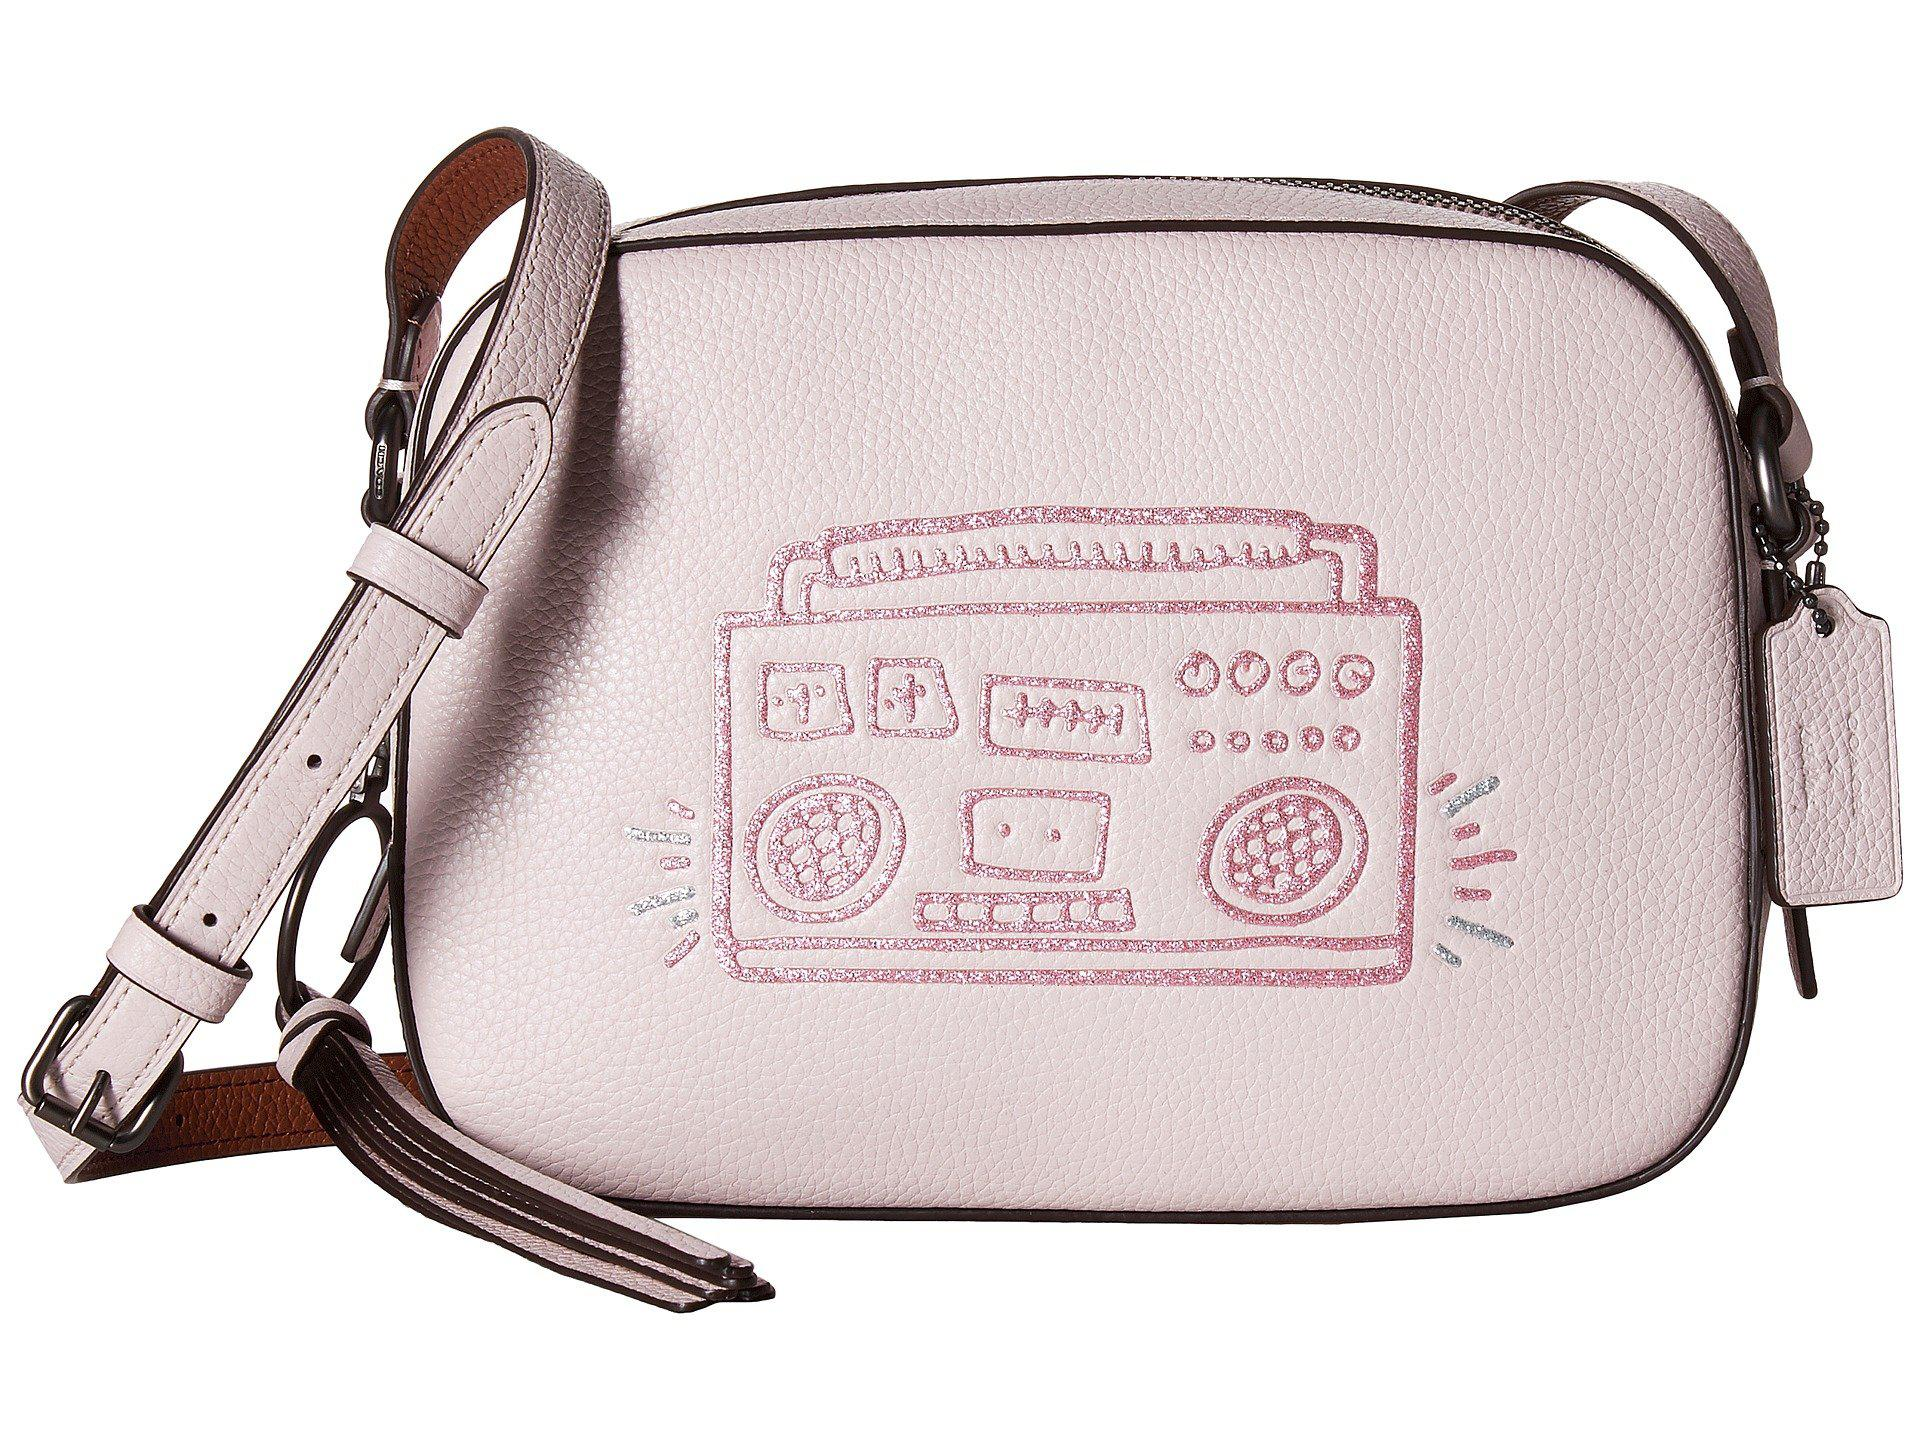 Cross Body Bags - Keith Haring Crossbody Bag Bright Pink - rose - Cross Body Bags for ladies Coach bO5CmdL30